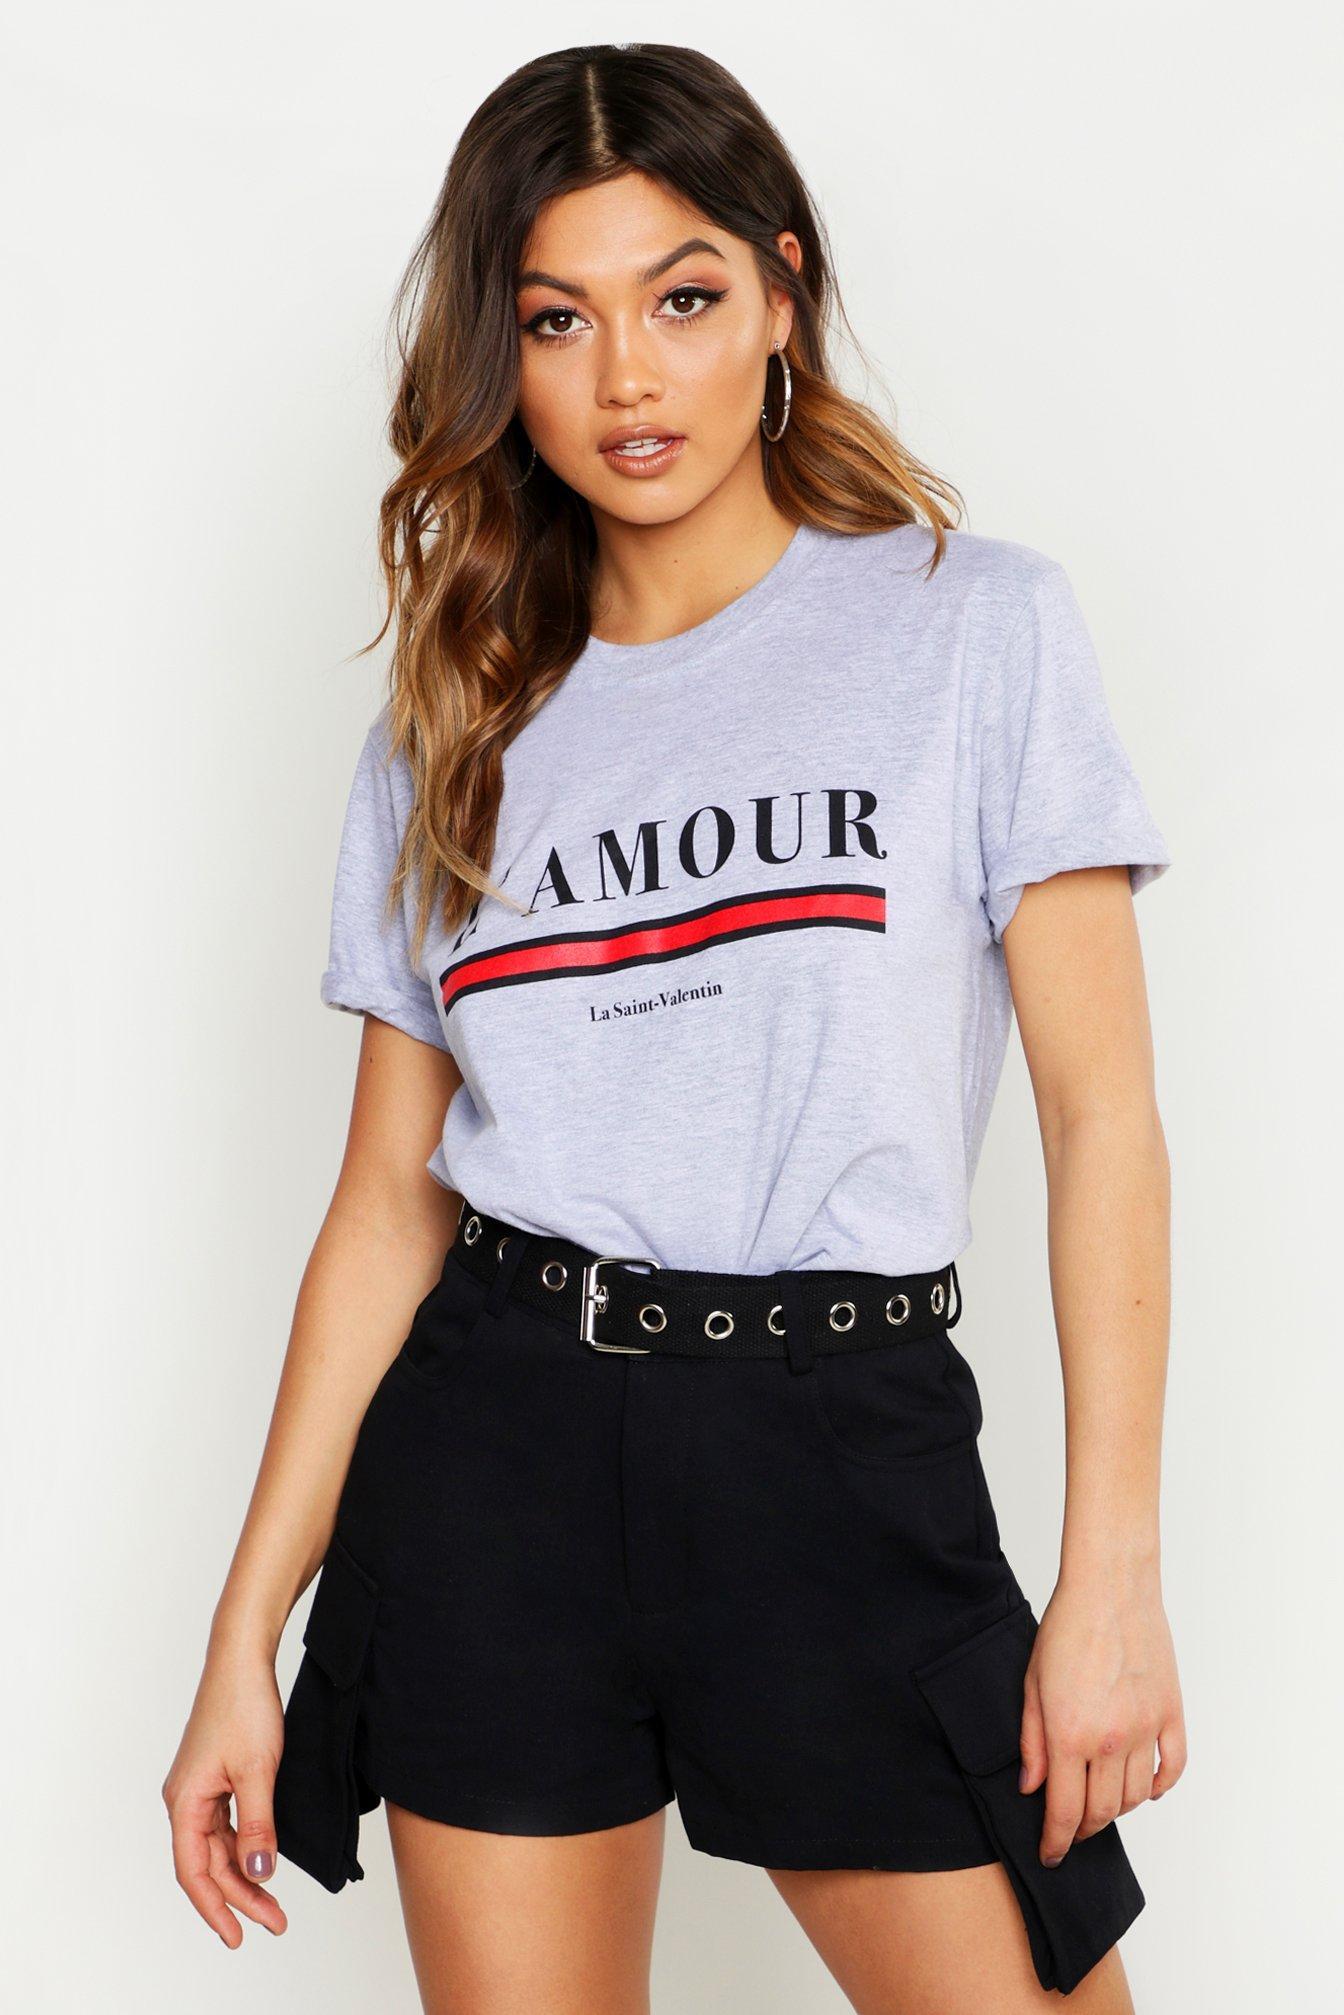 Womens T-Shirt mit L'amour Slogan - grey - M, Grey - Boohoo.com